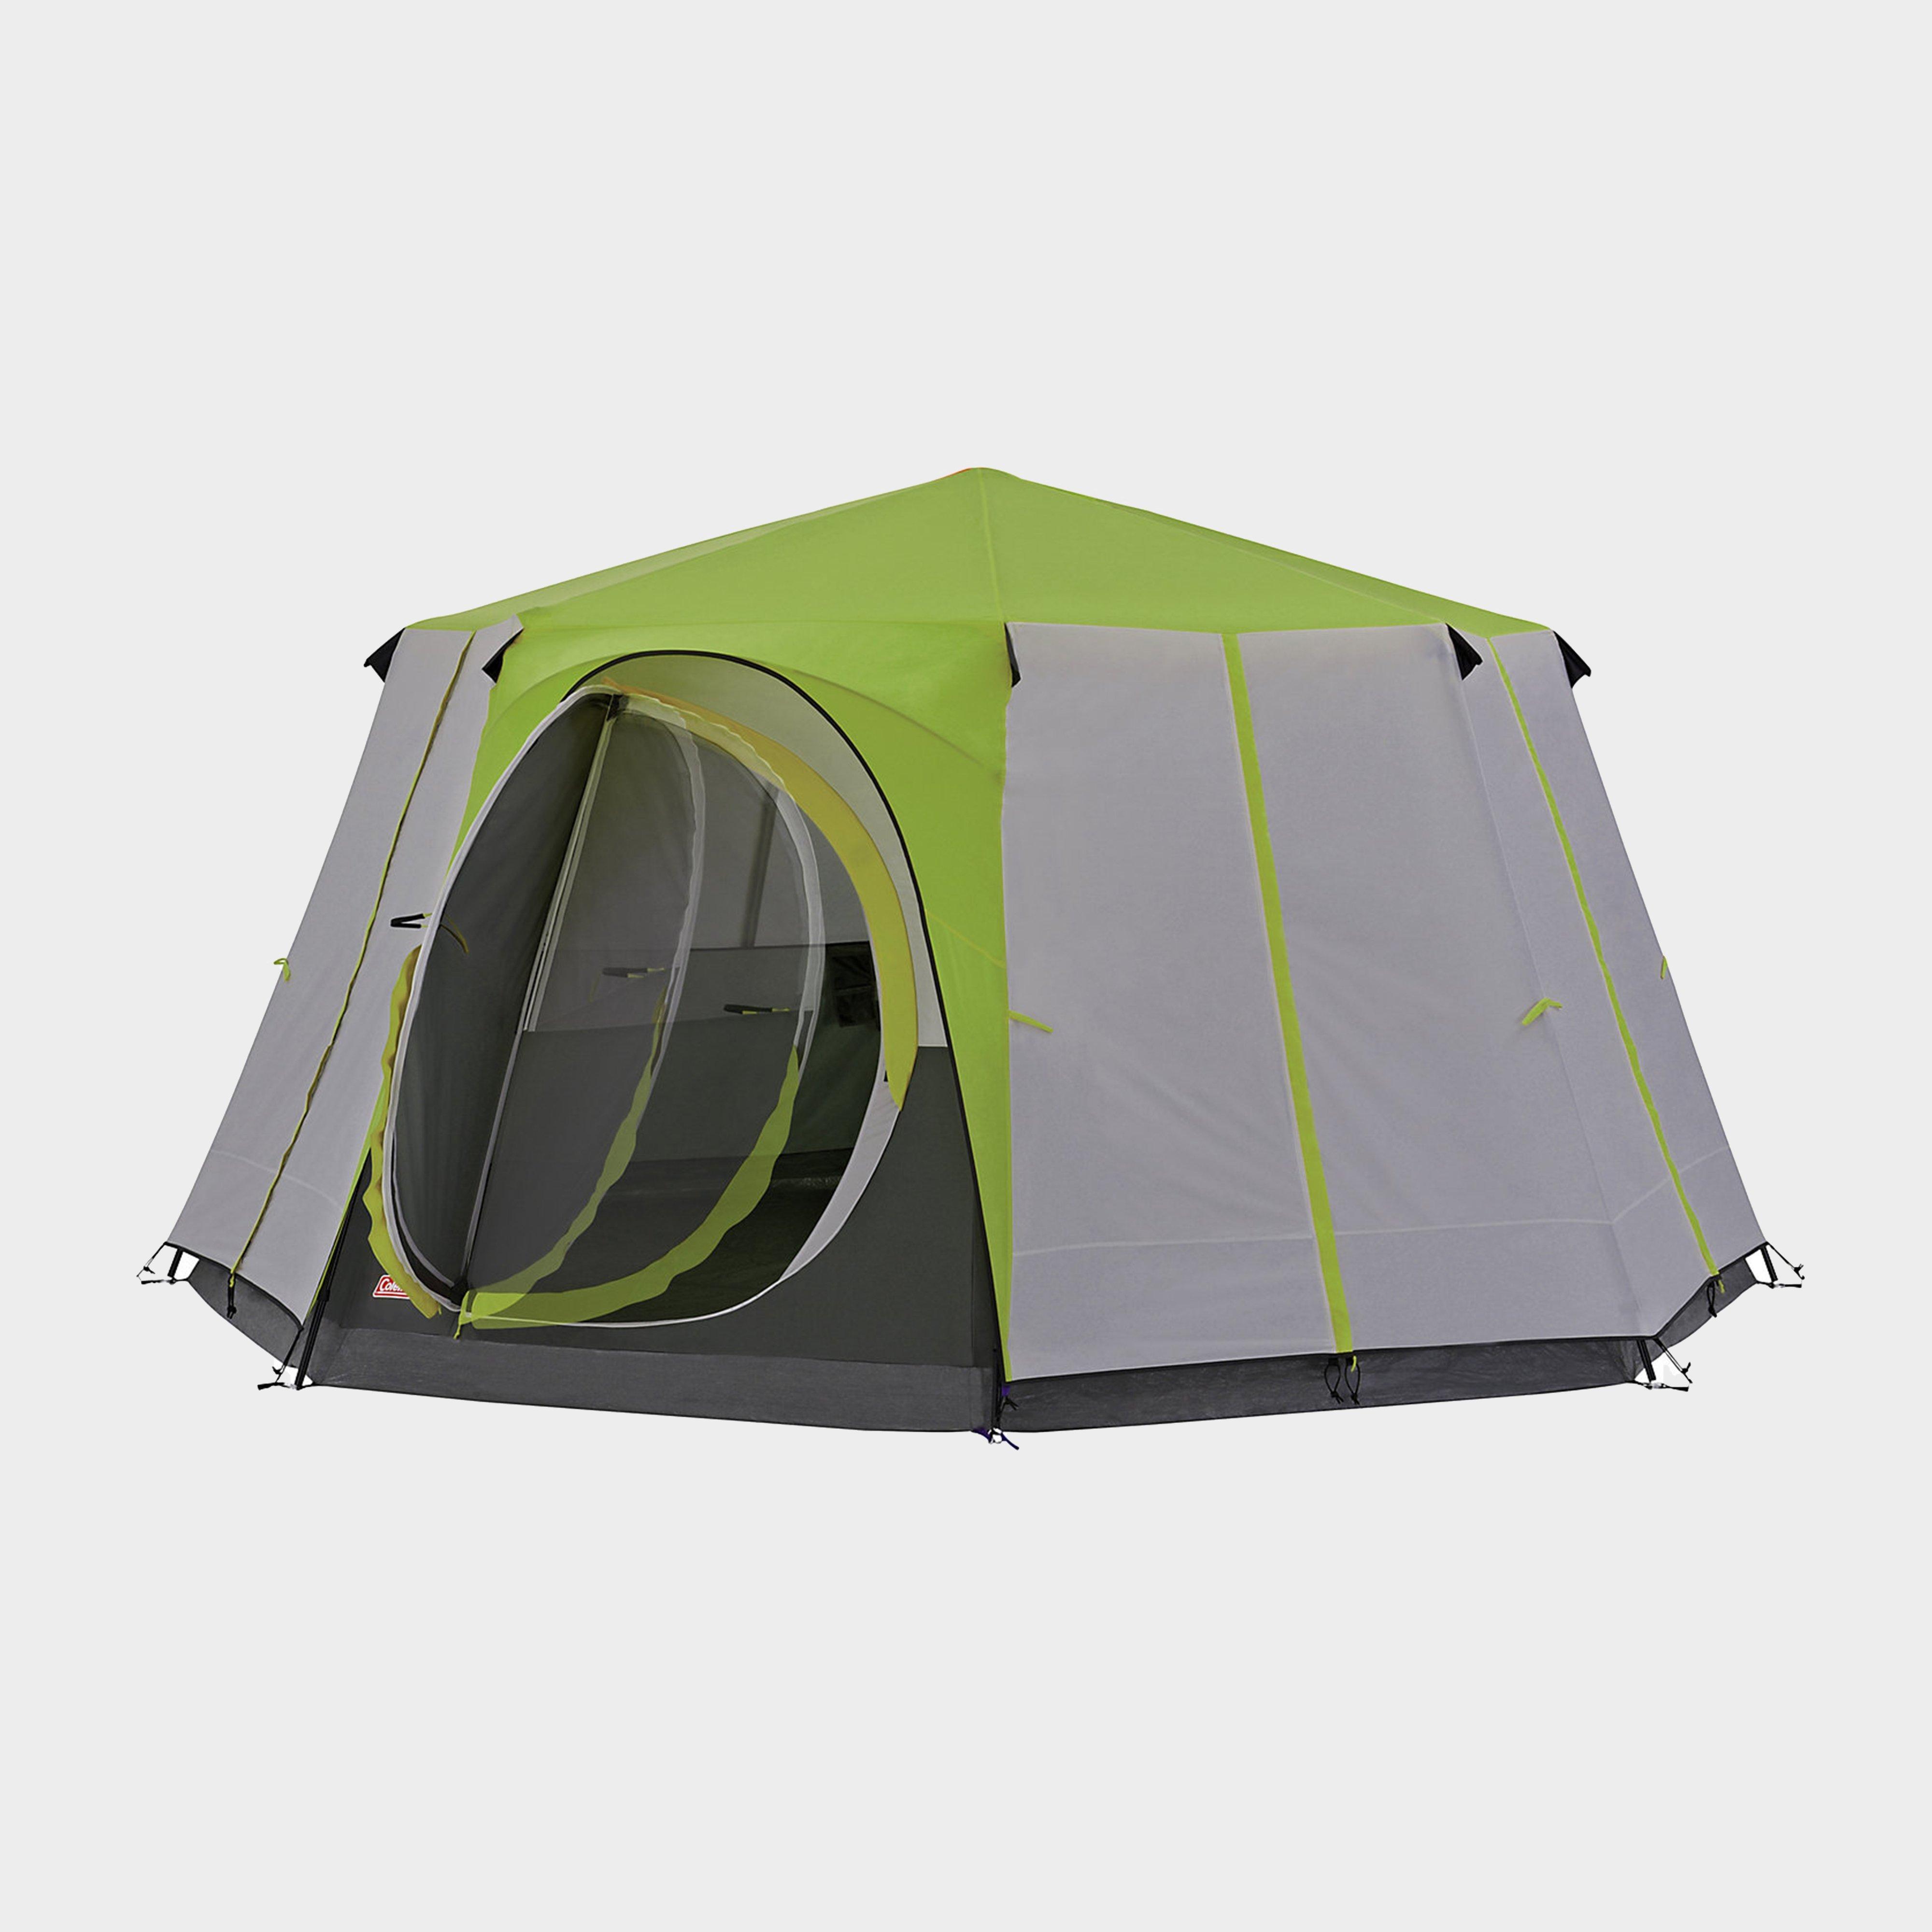 Coleman Cortes Octagon 8 Tent - Green/grn  Green/grn